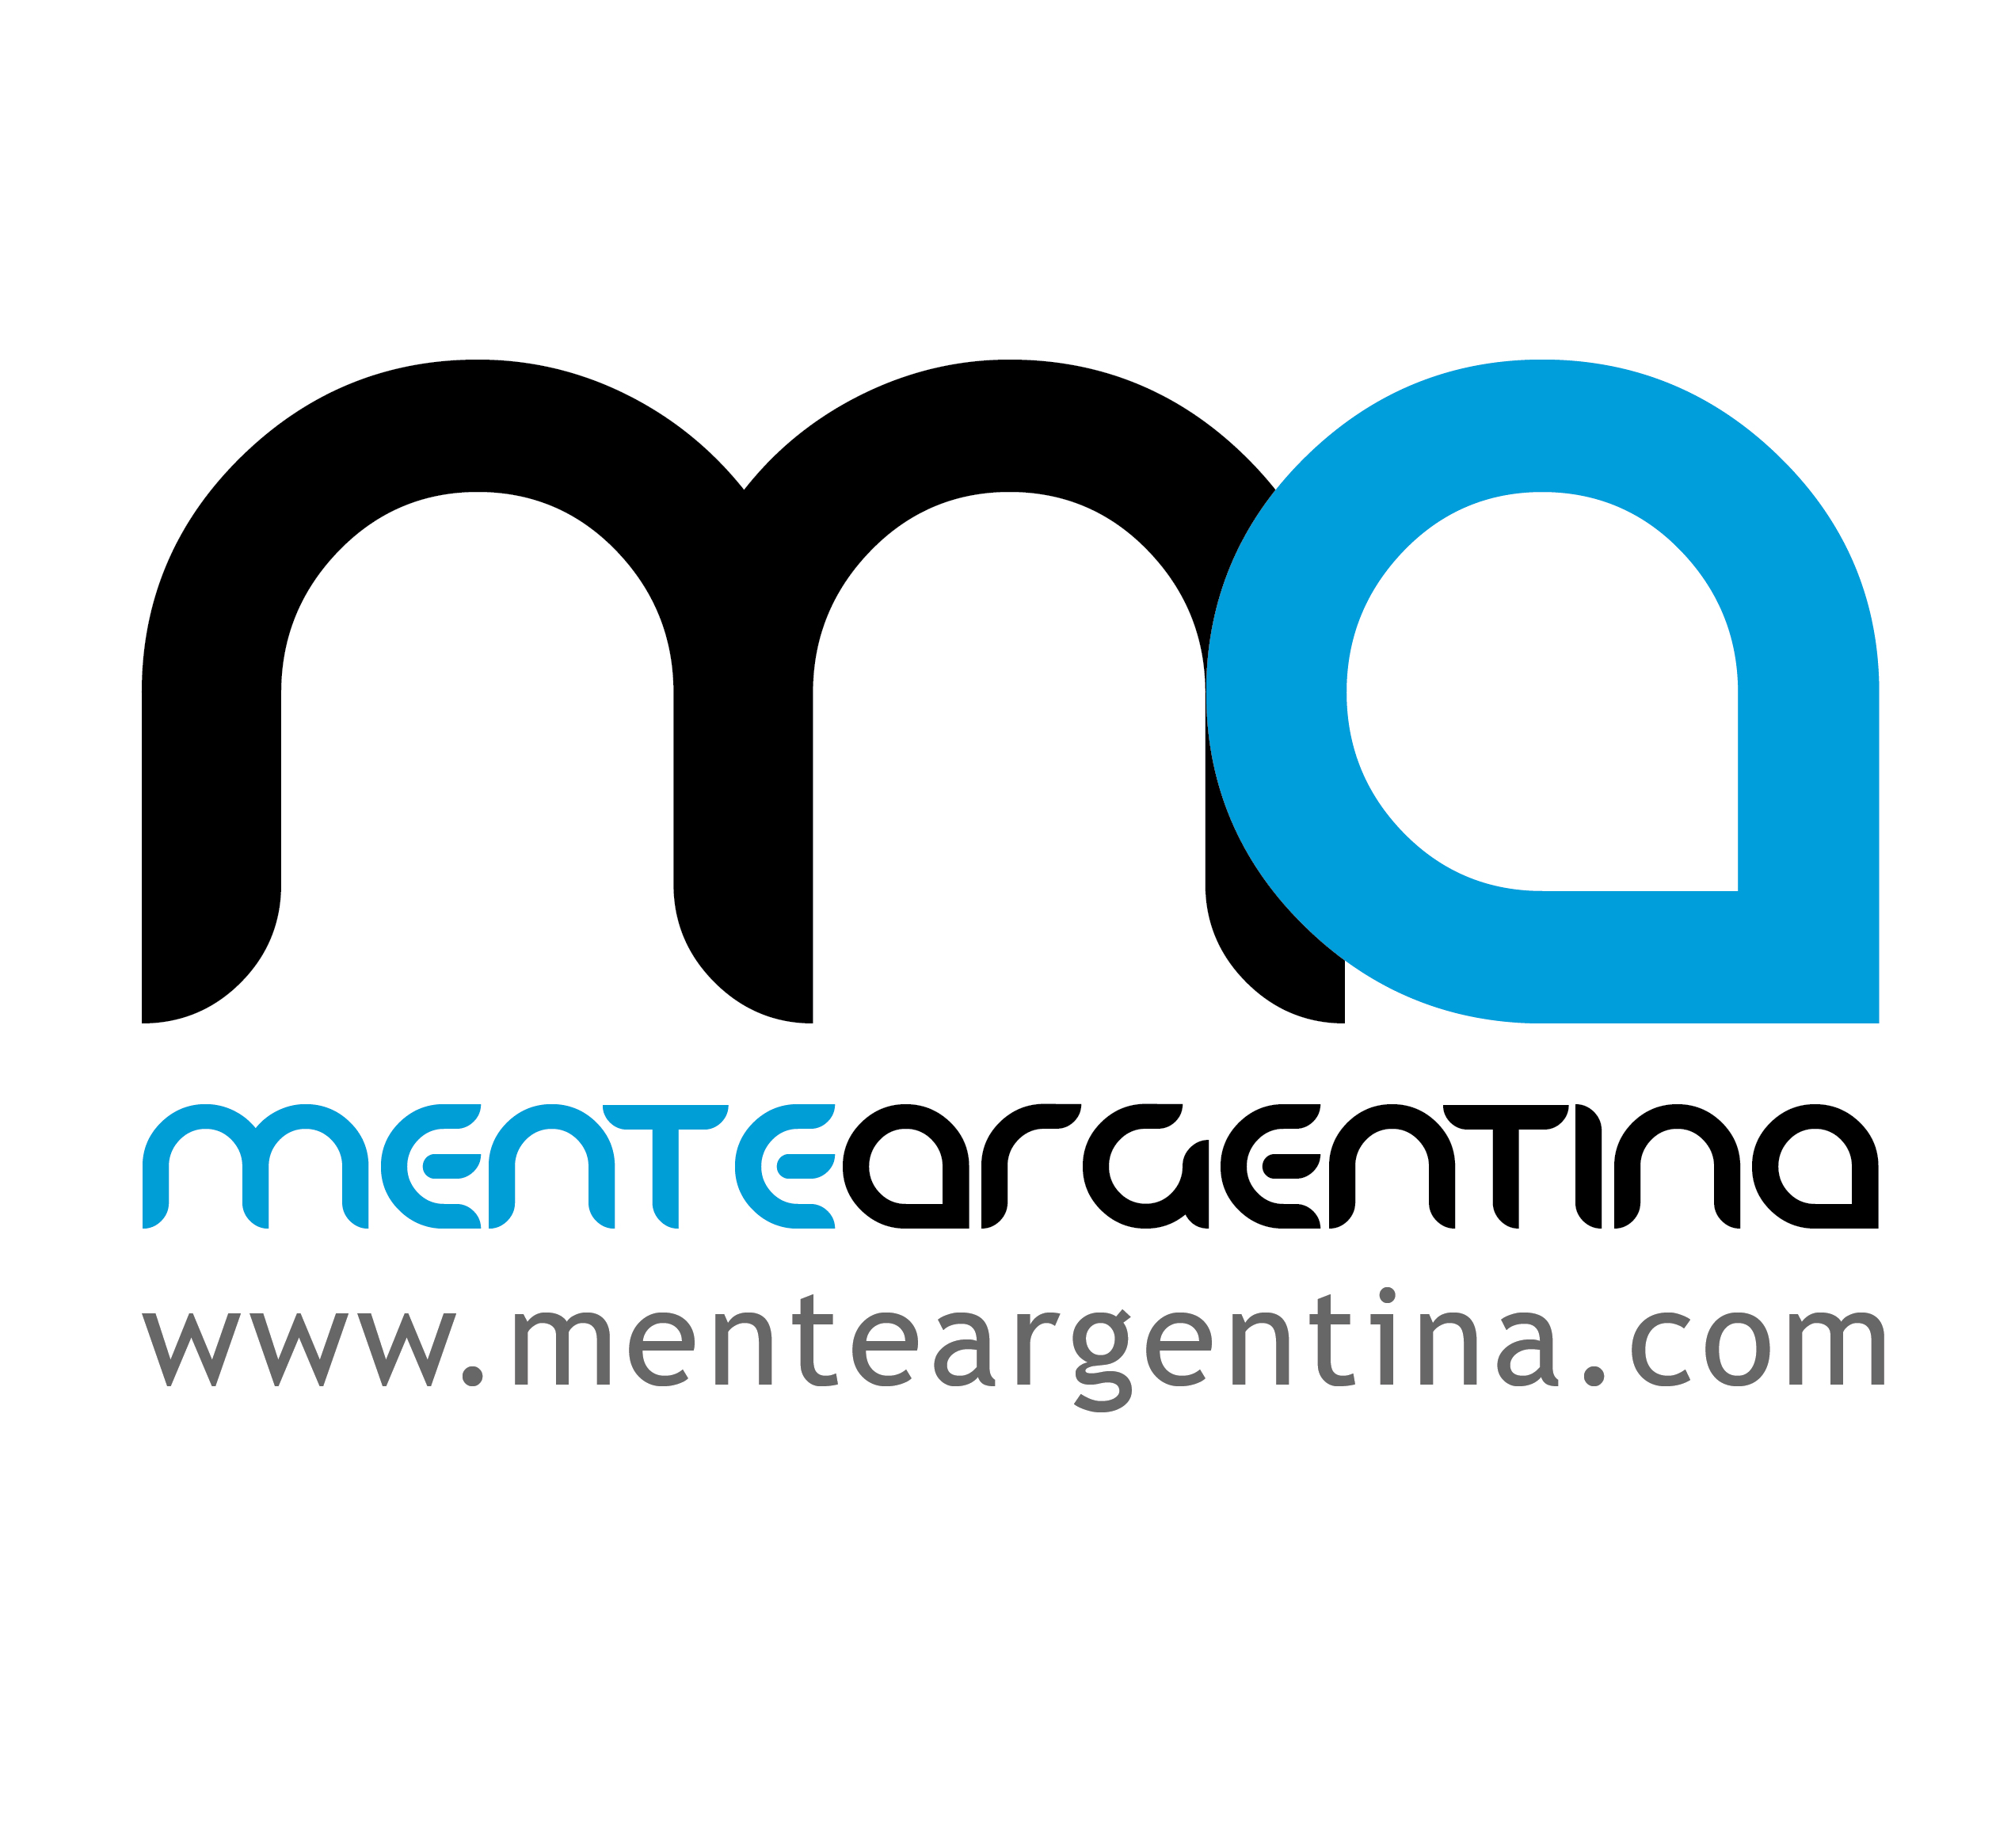 Mente Argentina: Internship Program in Buenos Aires